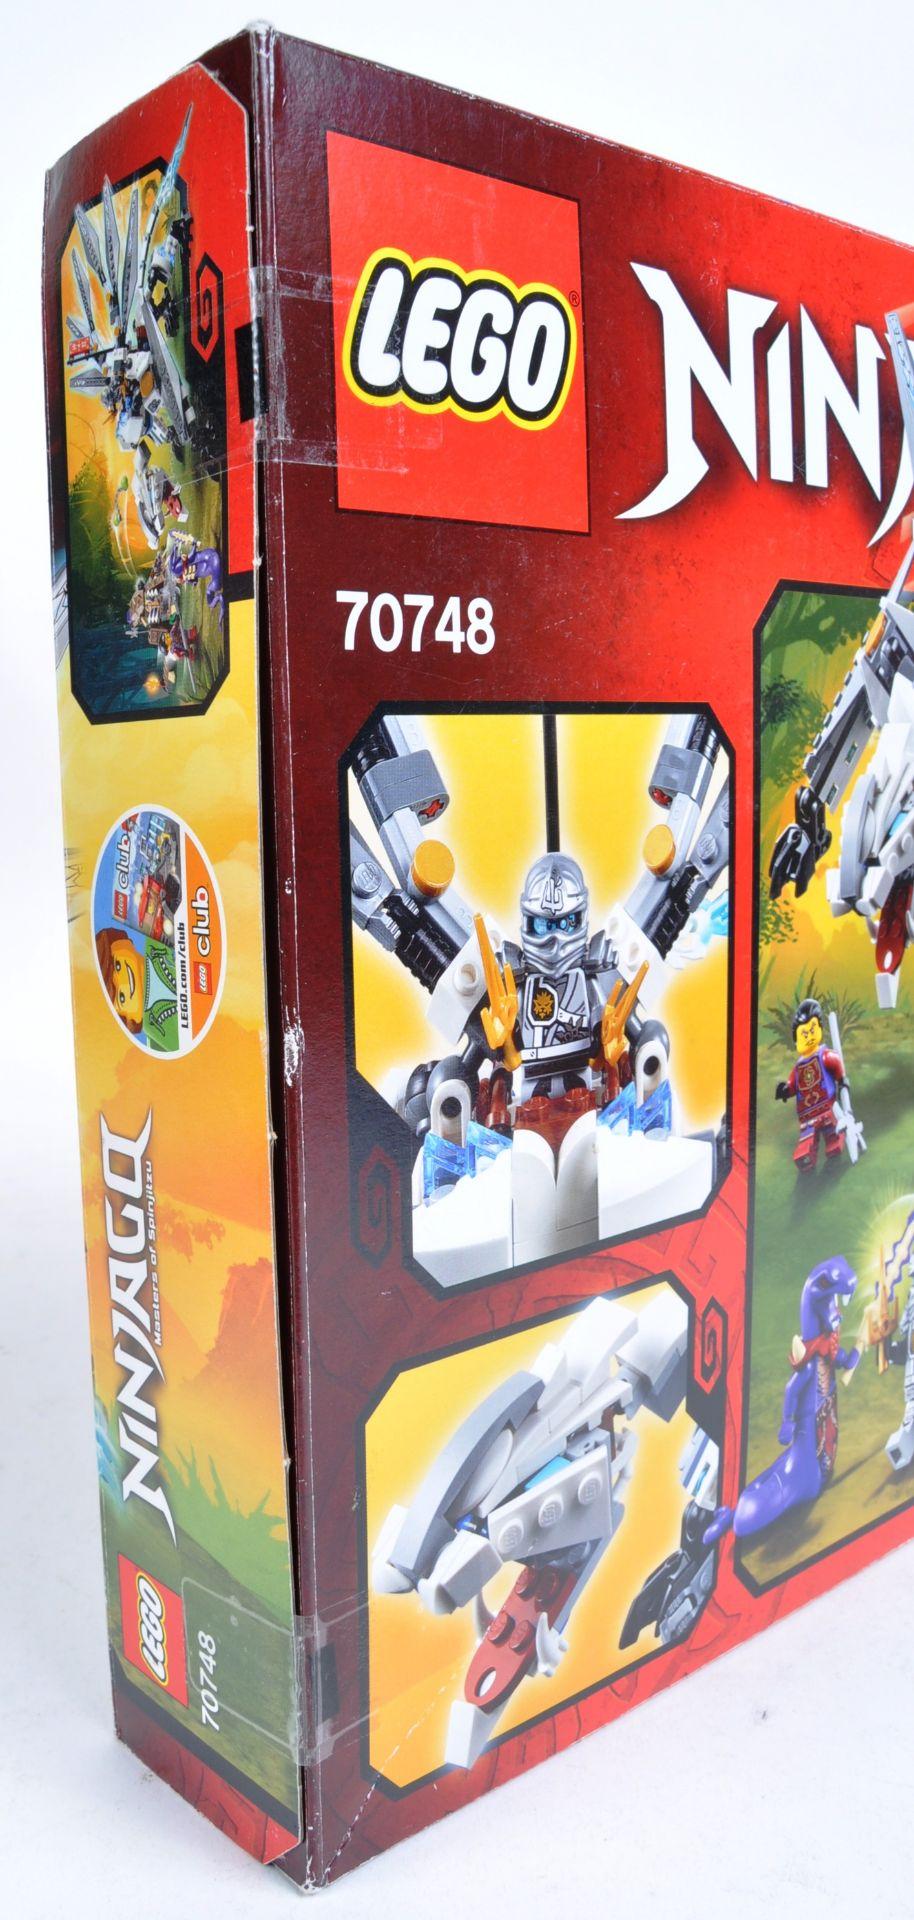 LEGO SETS - LEGO NINJAGO - 70589 / 70592 / 70746 / 70748 - Image 8 of 10